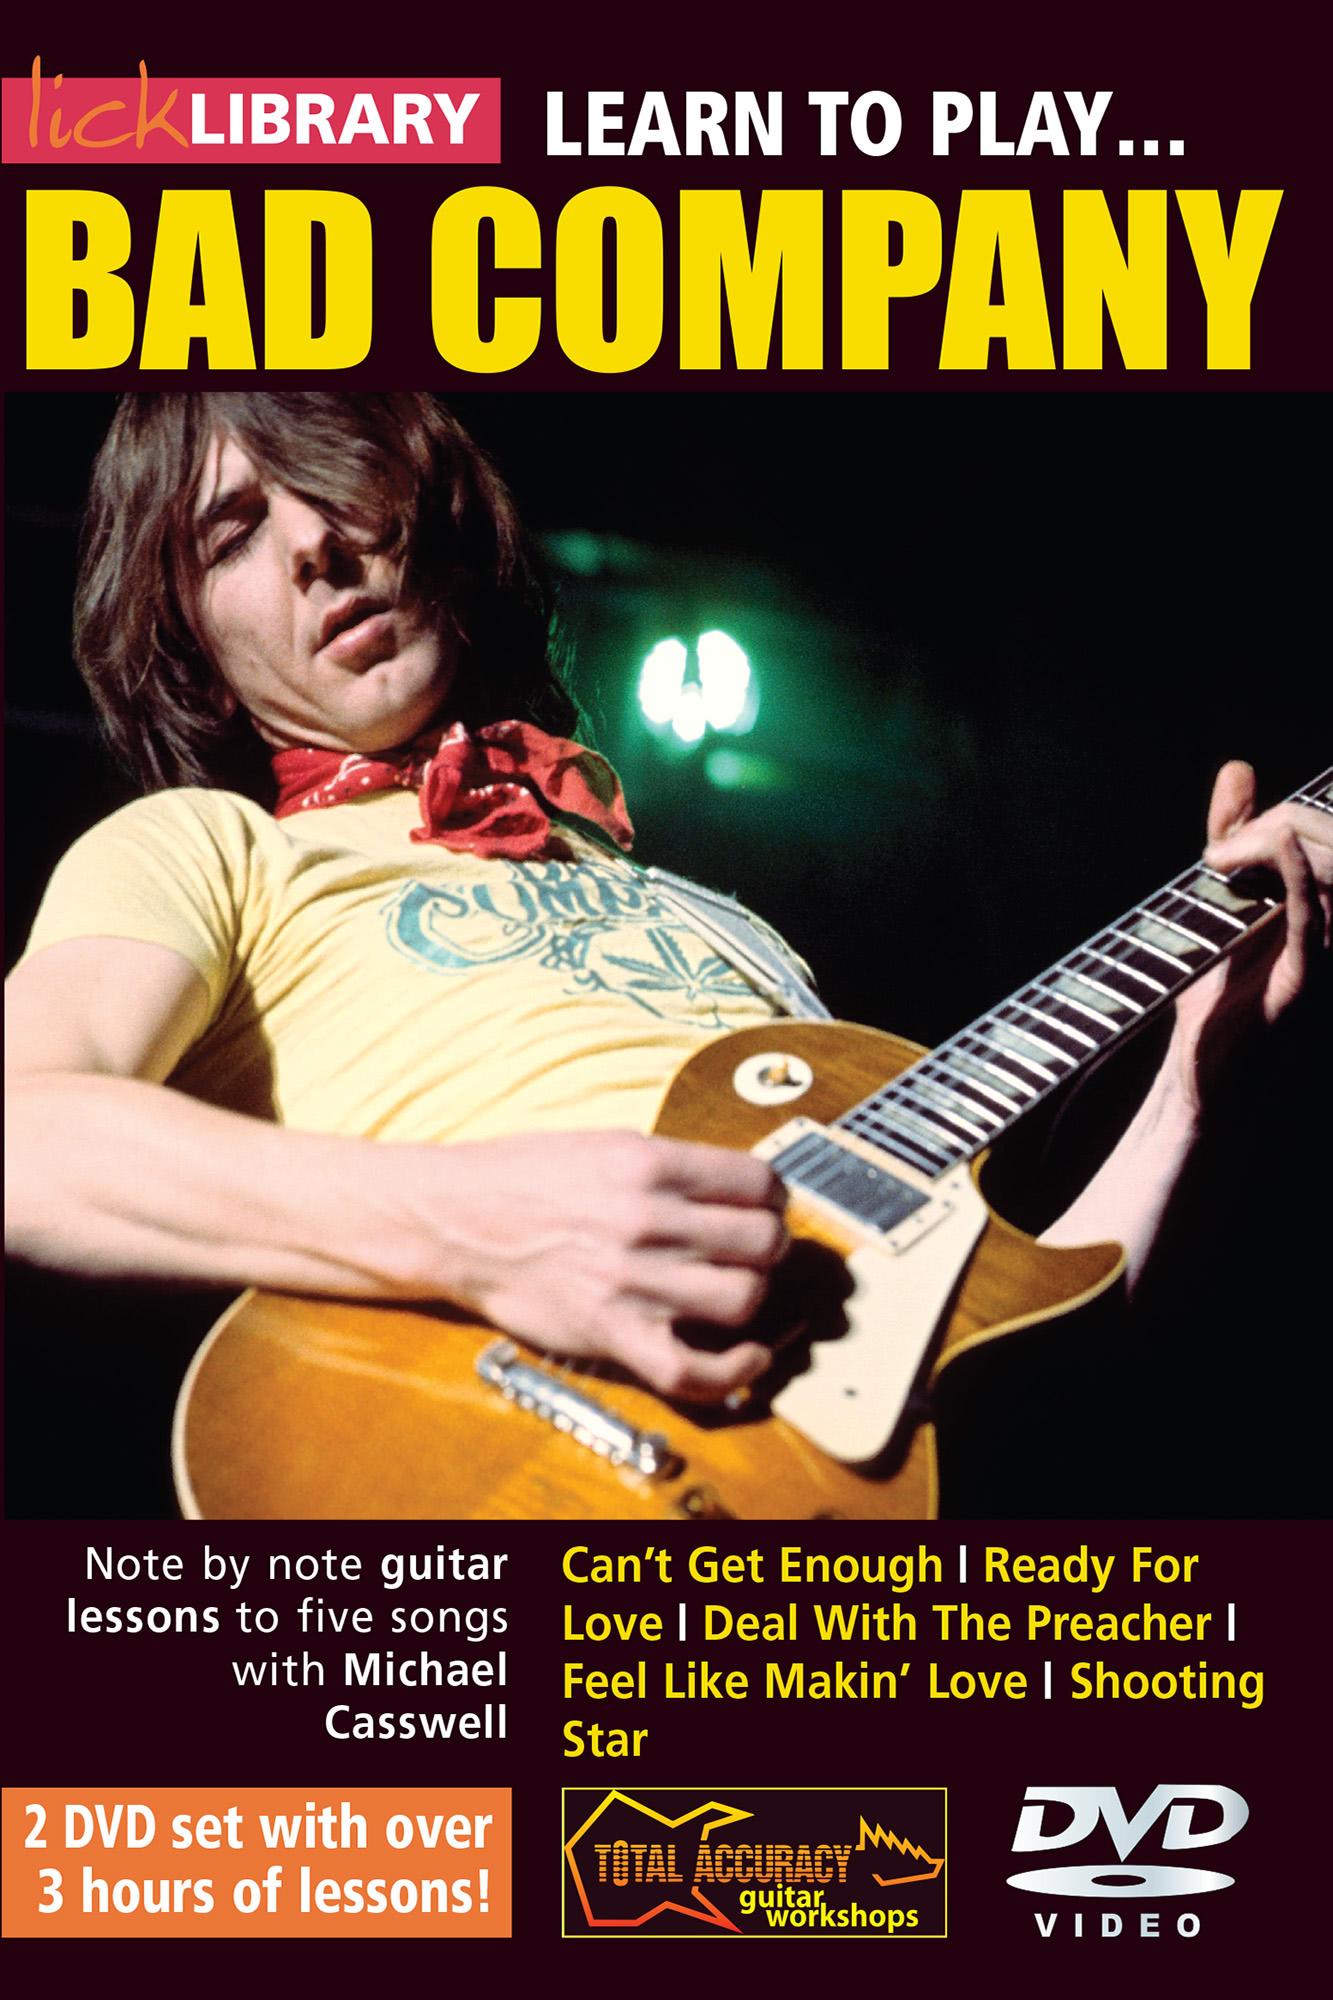 Learn To Play Bad Company